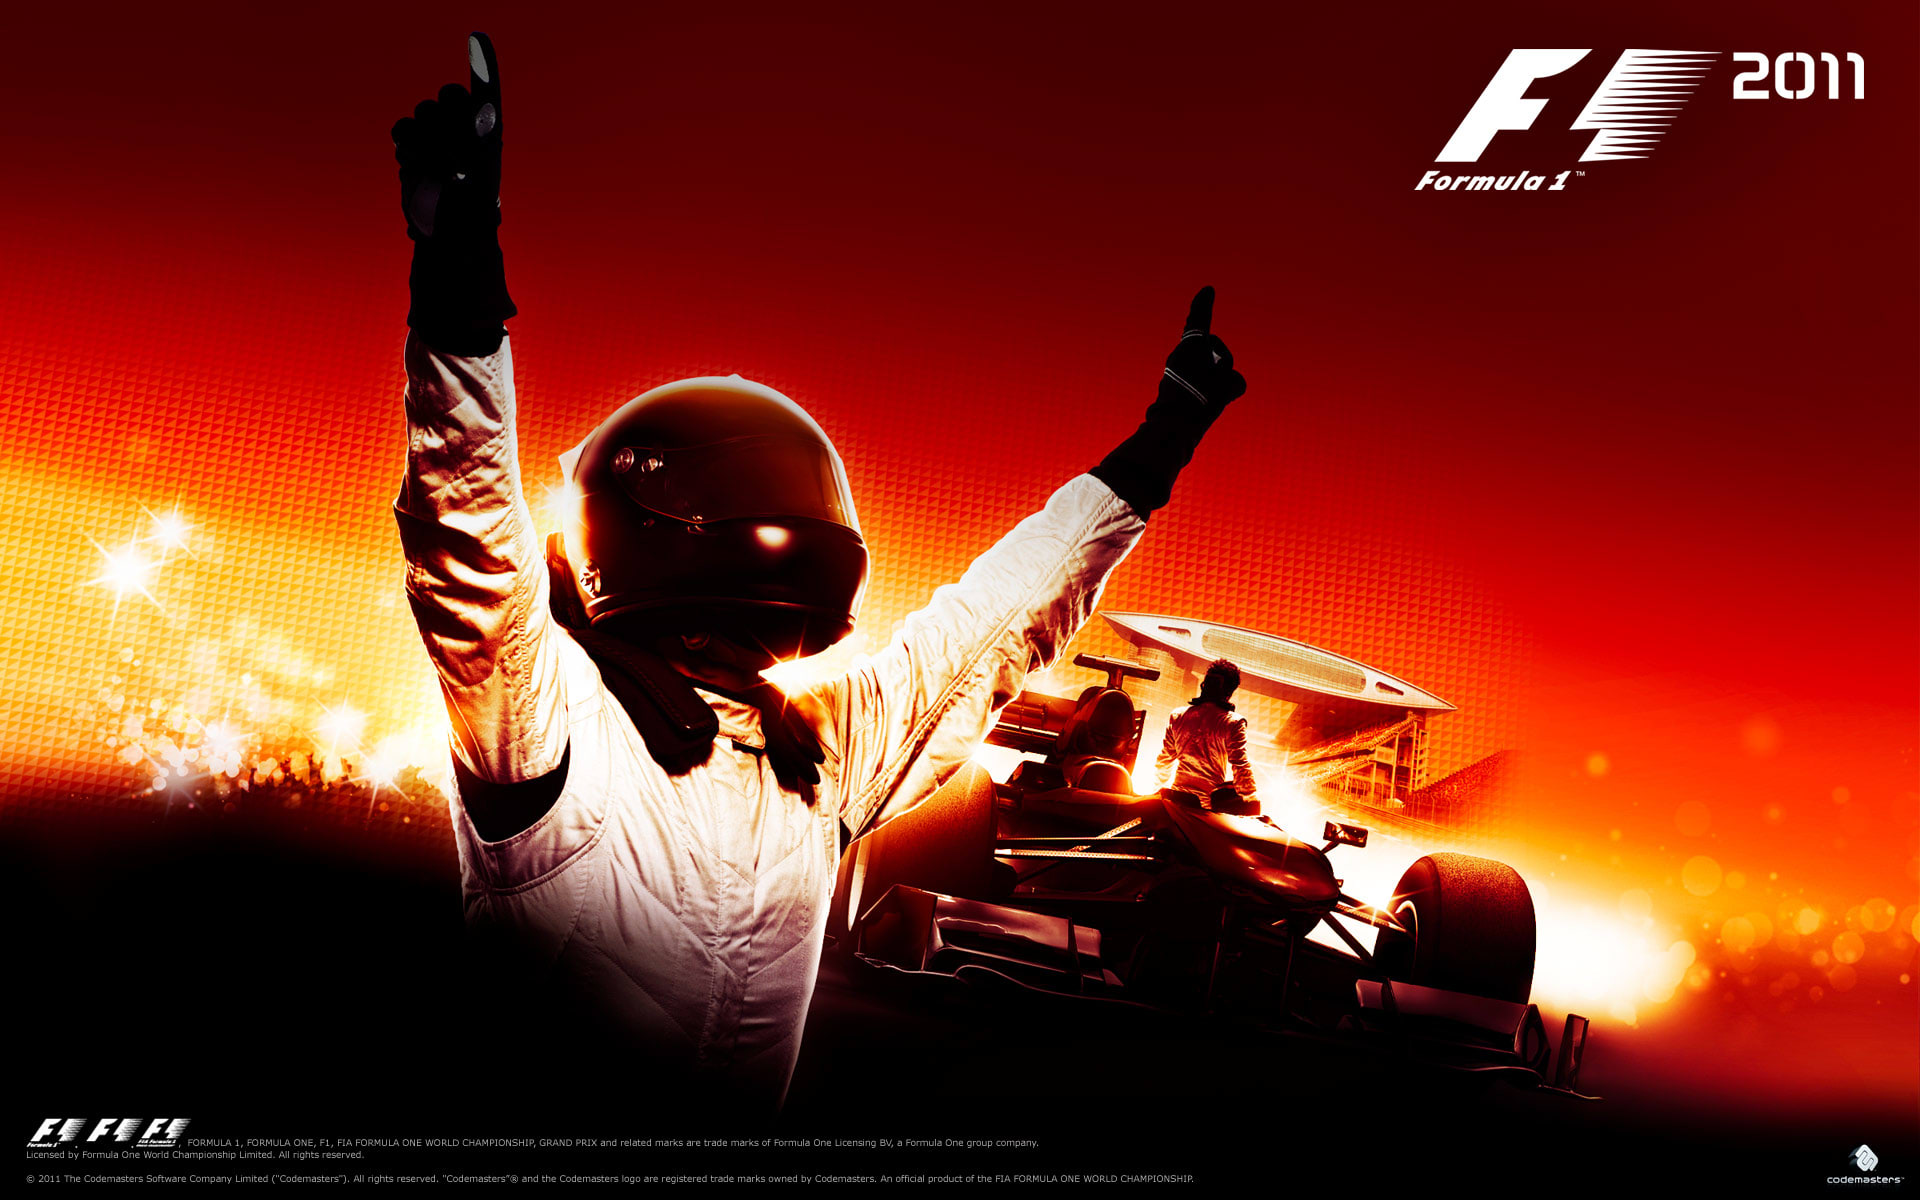 F1 2011 Papel de Parede